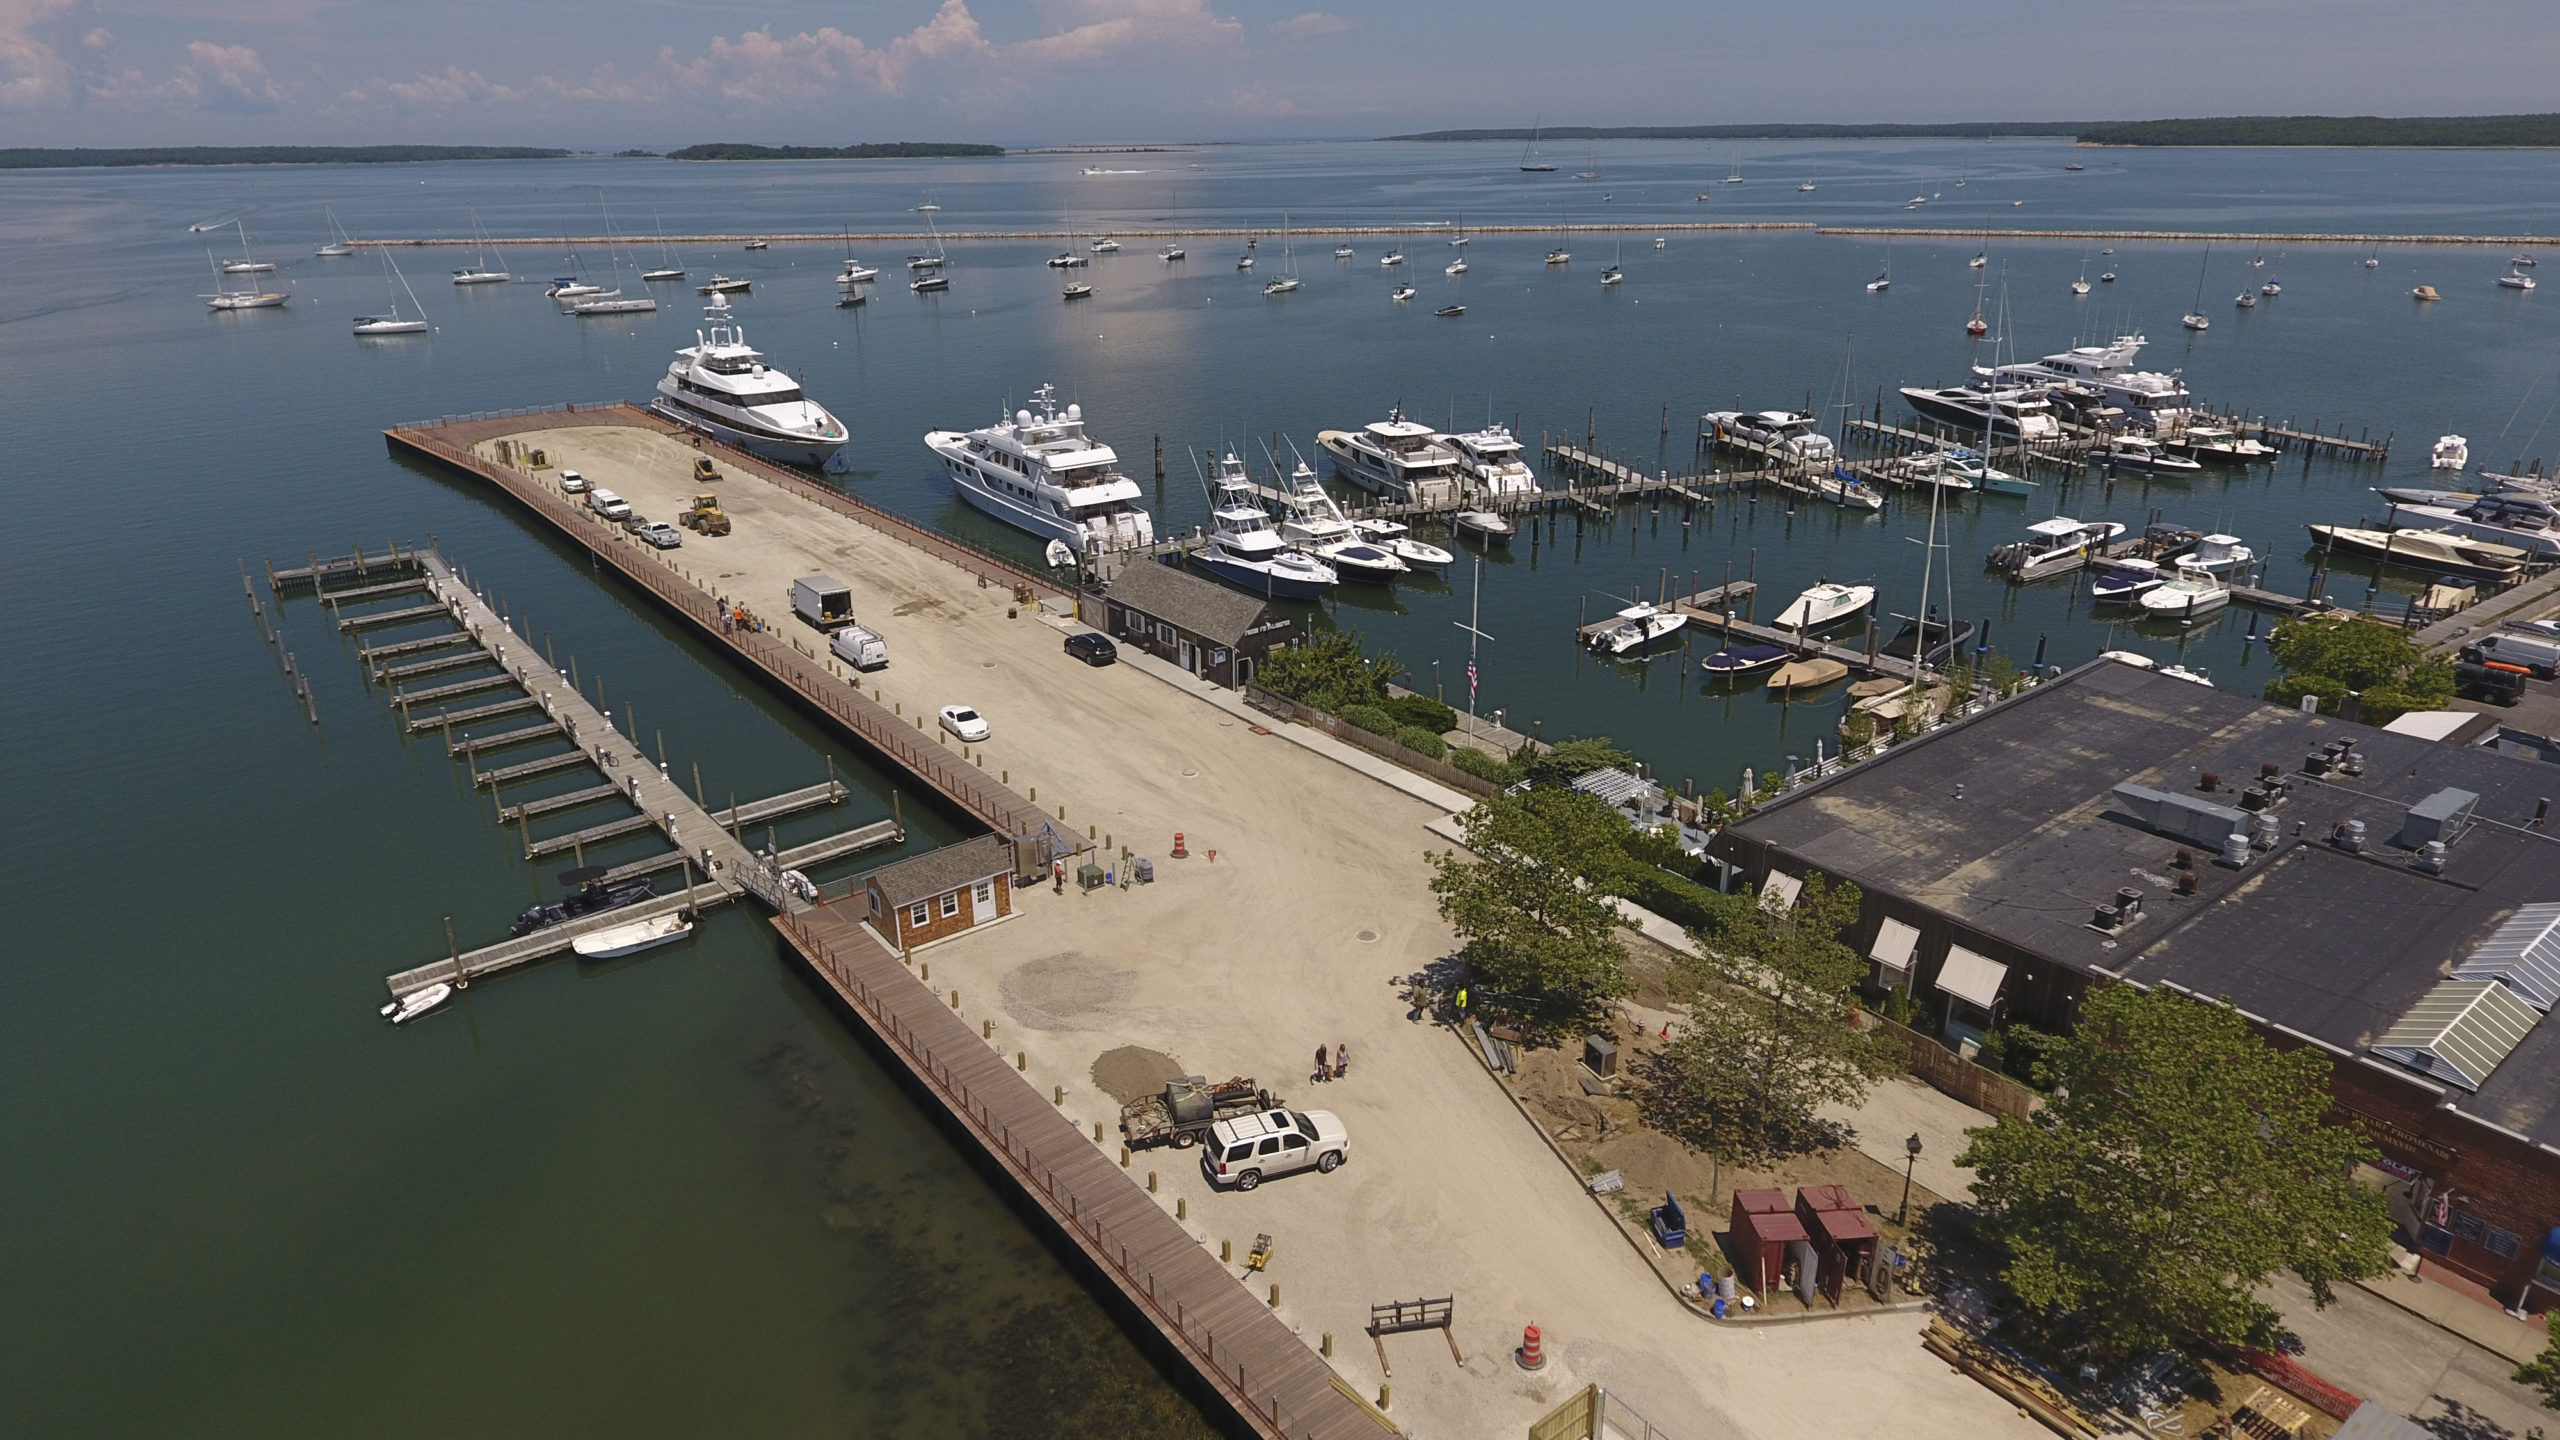 A birdseye view of Long Wharf in Sag Harbor.